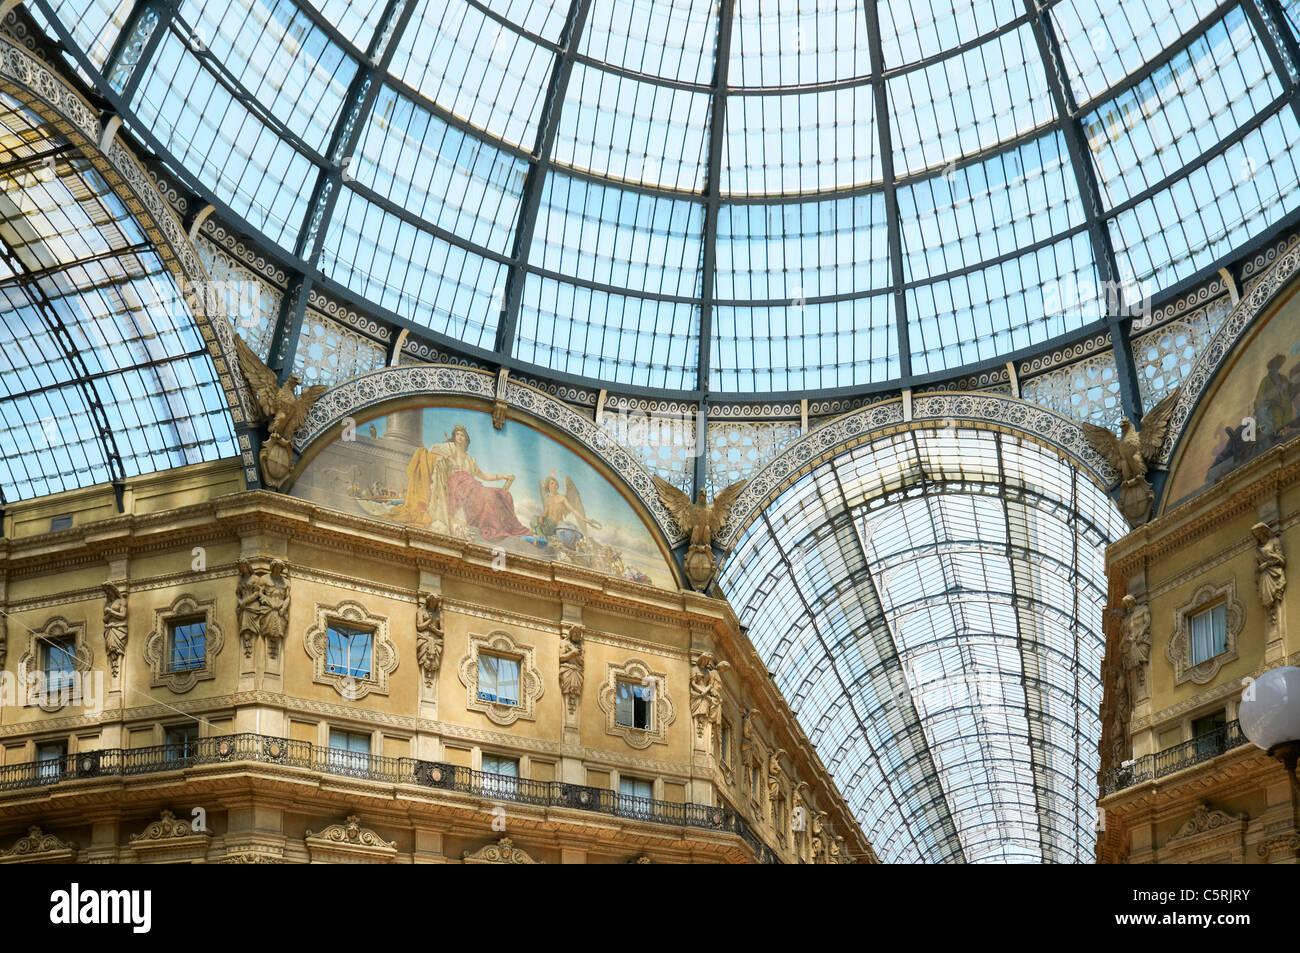 The Galleria Vittorio Emanuele II, Milan, Italy - Stock Image